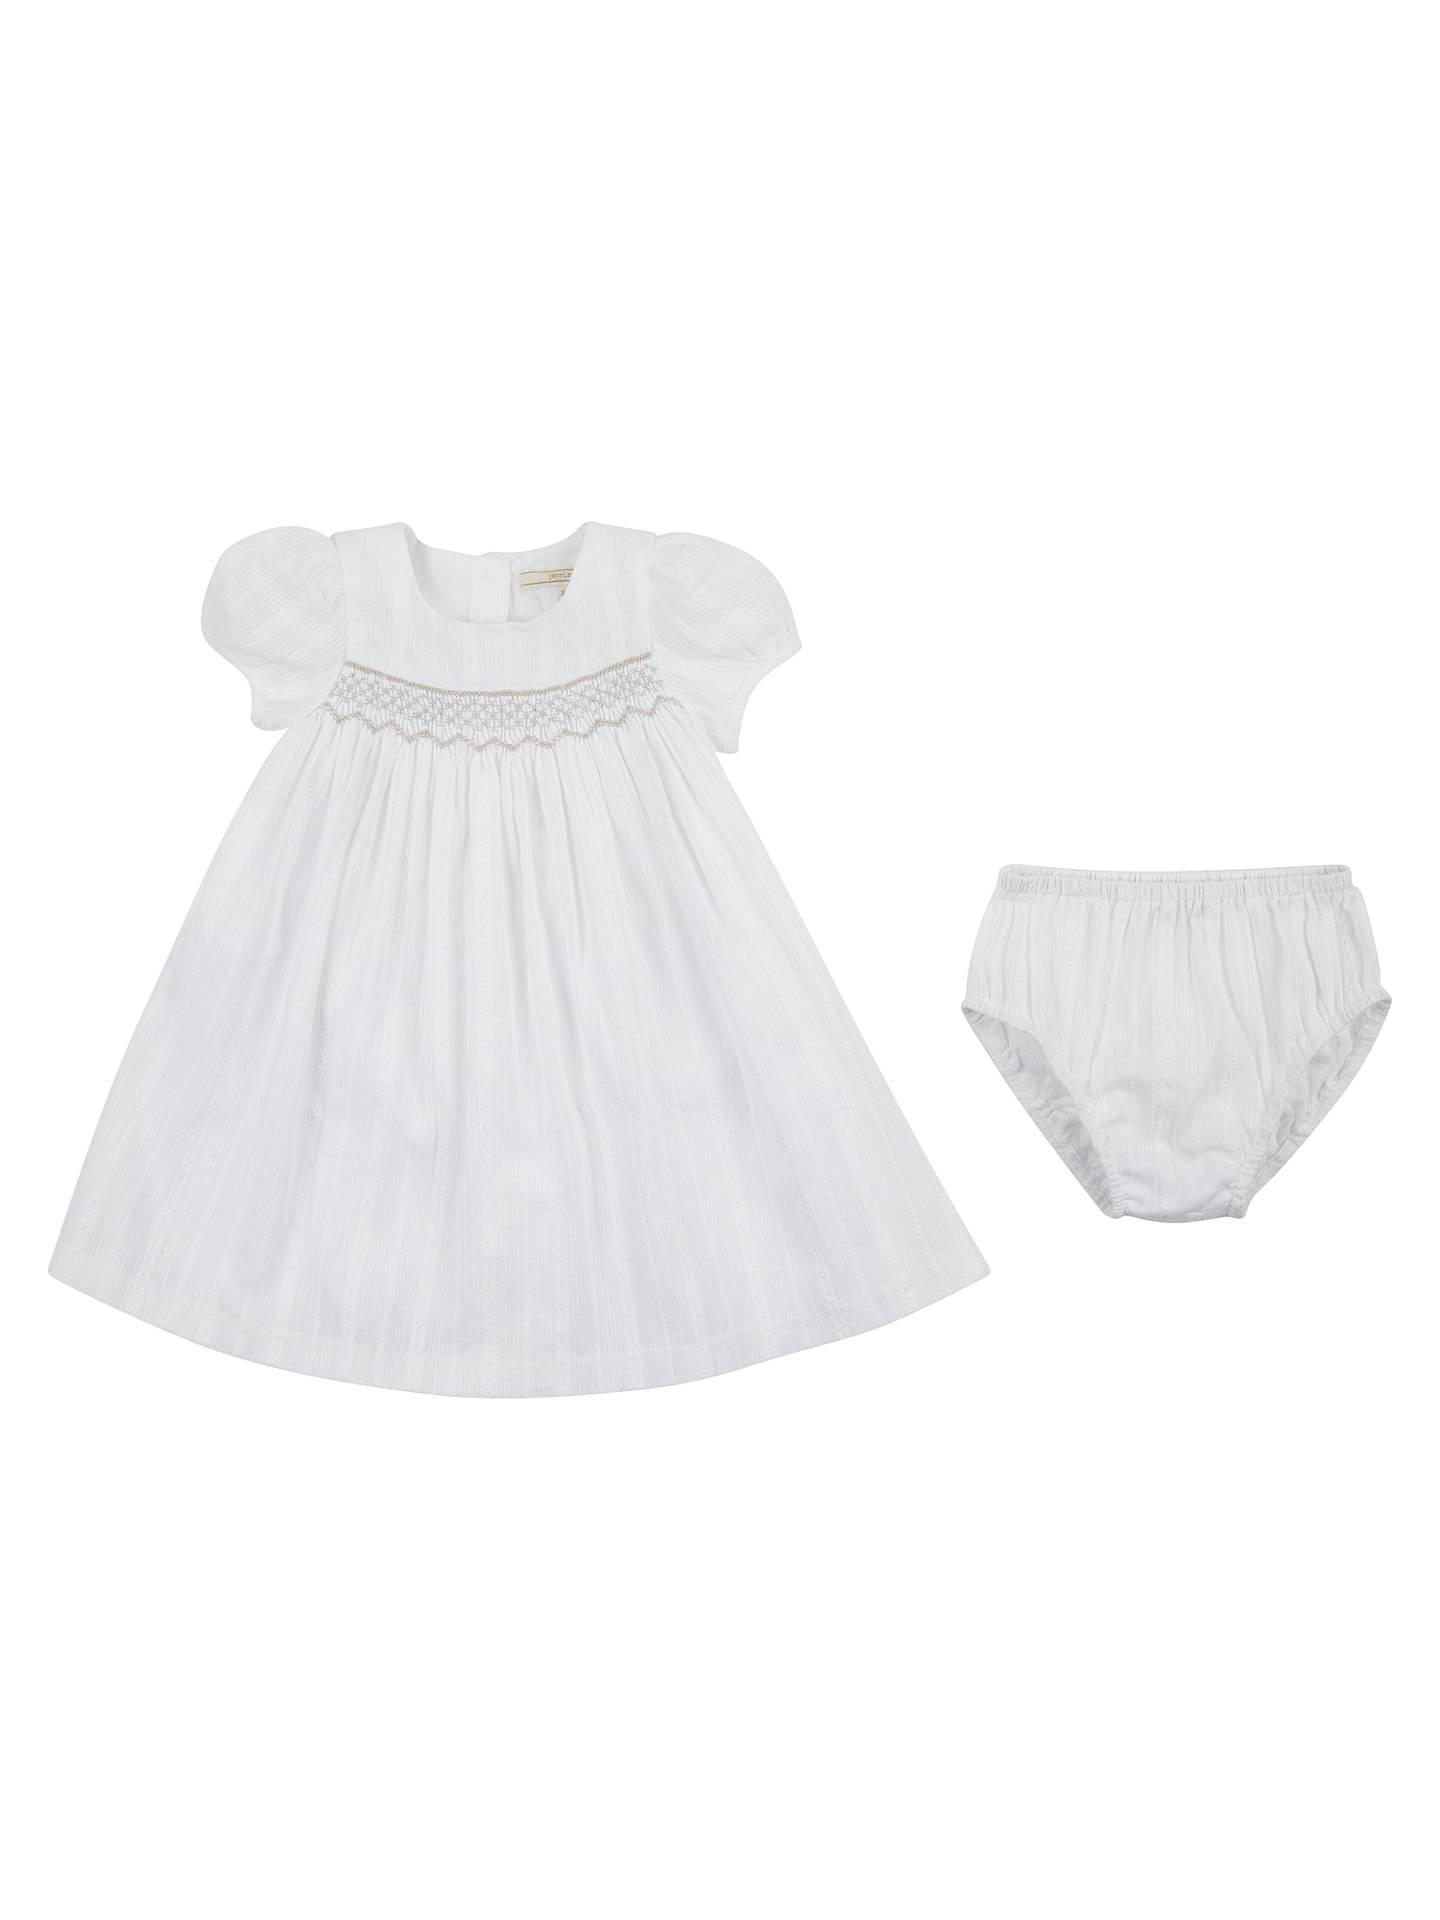 Newborn Smocked Dresses